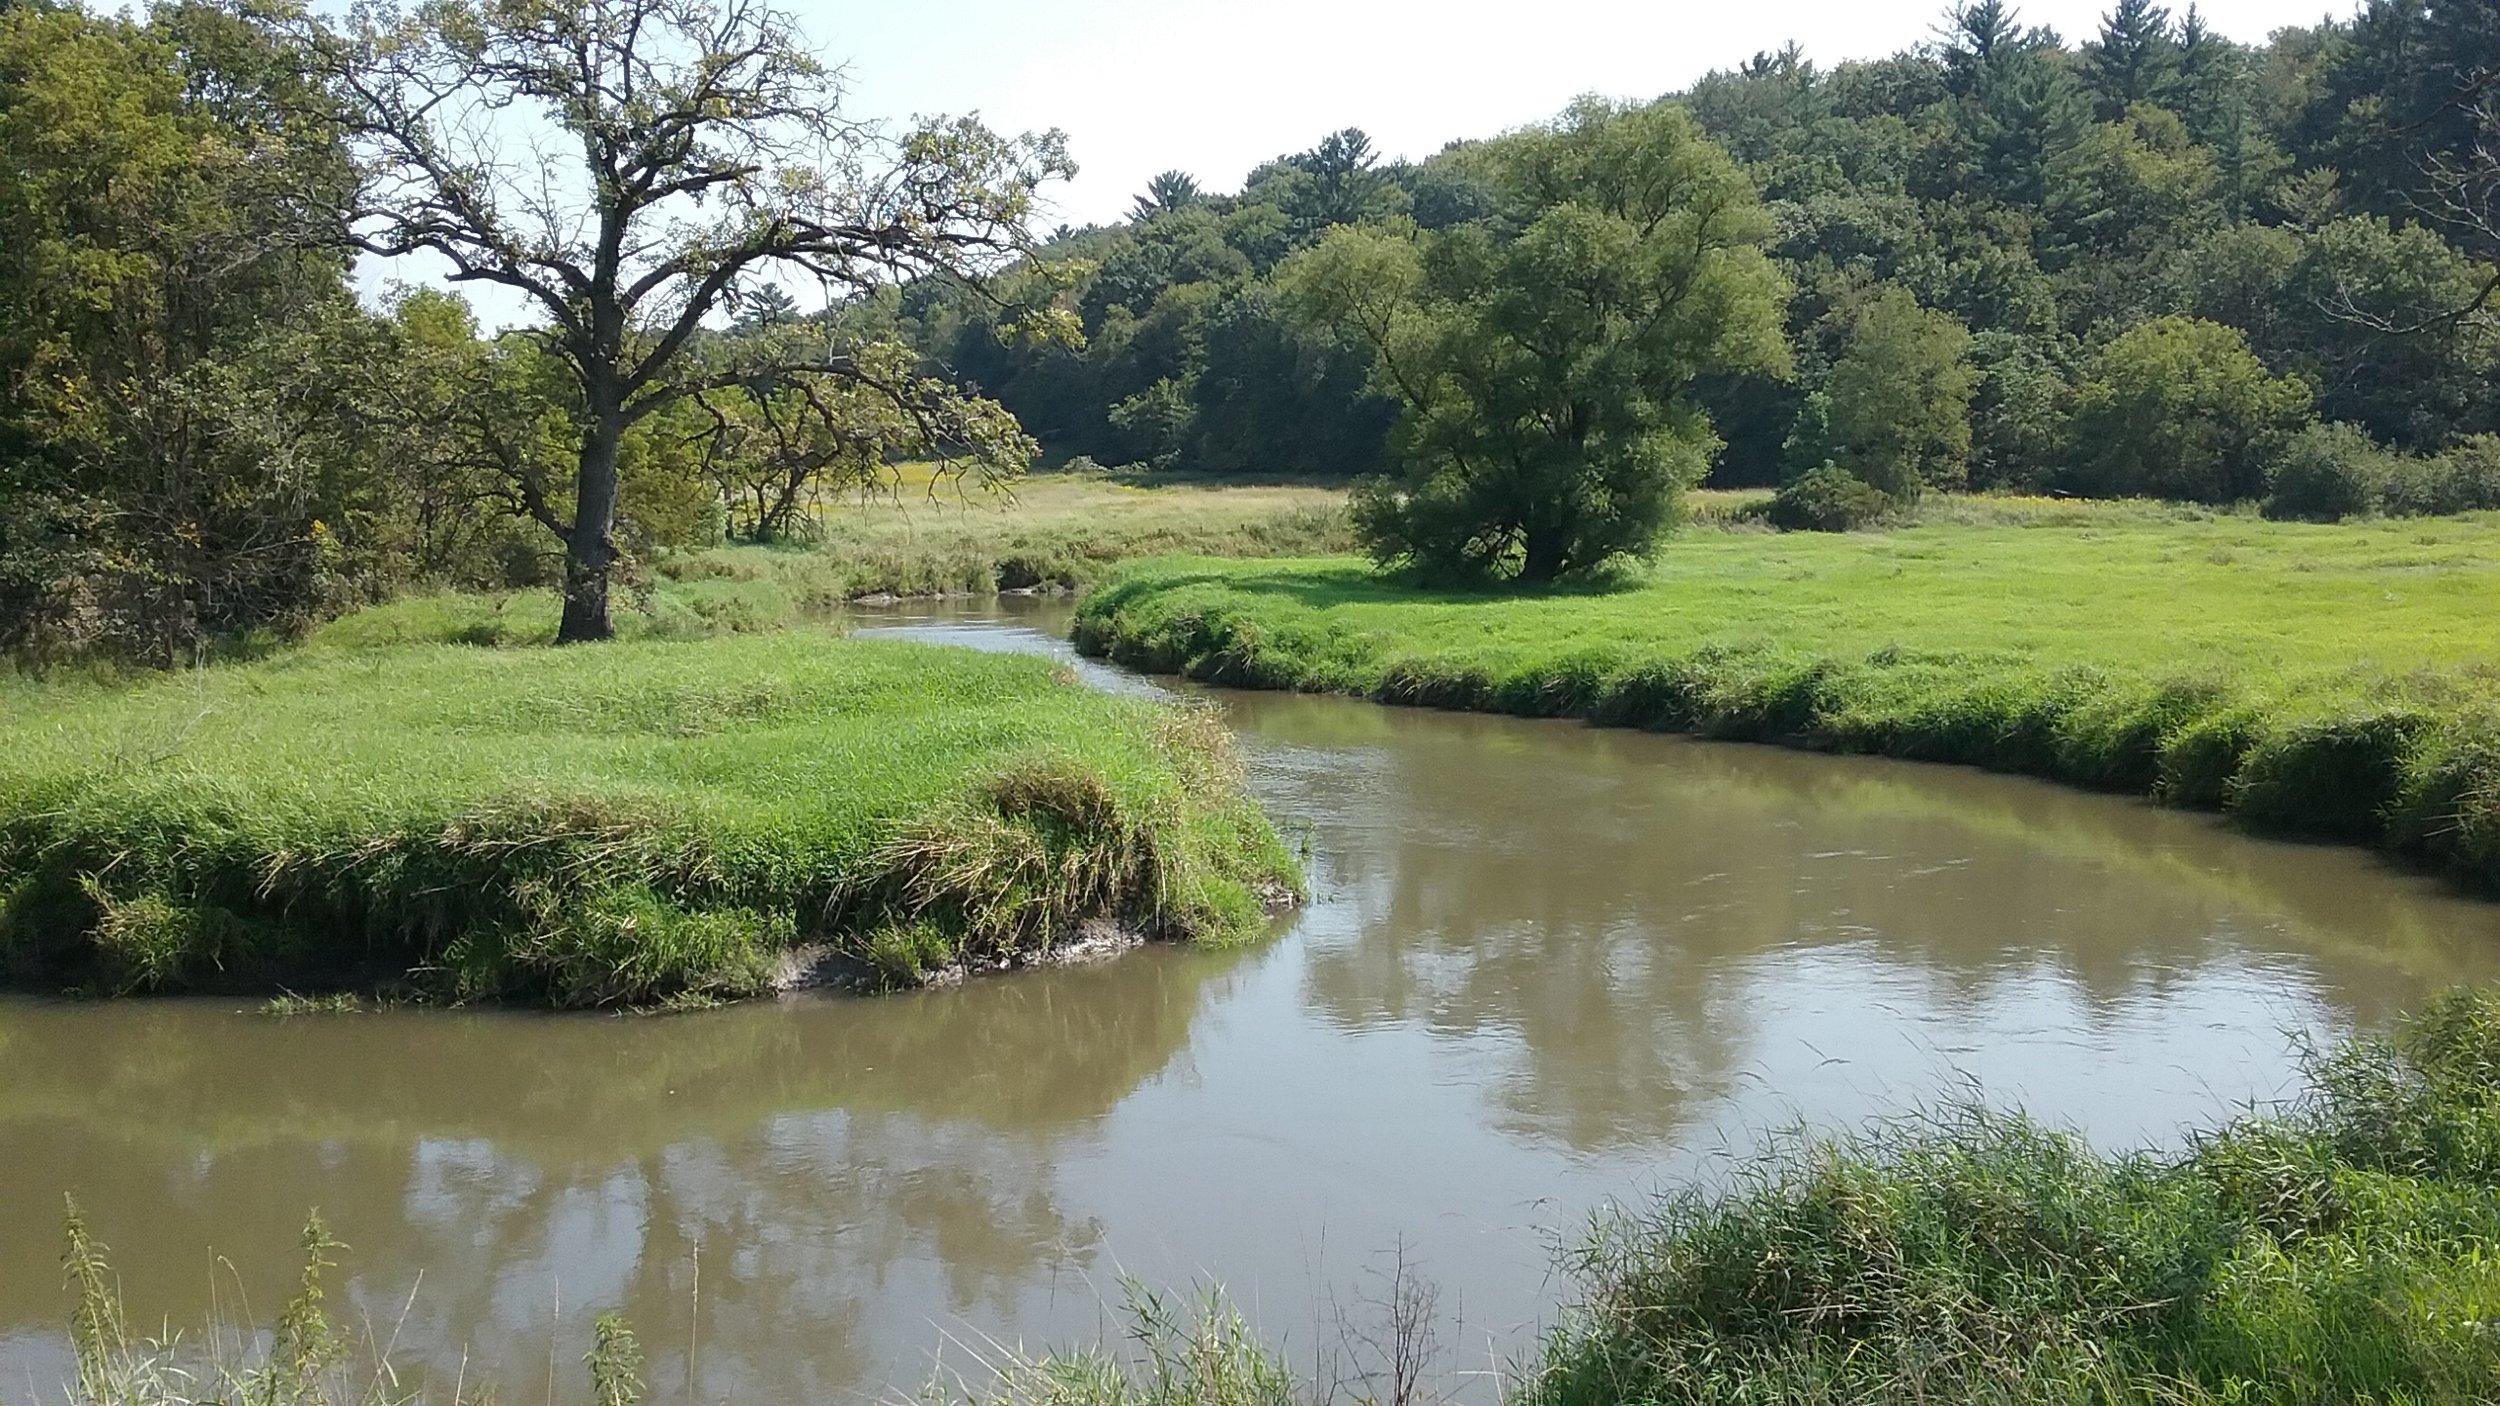 Baraboo River near Hwy 33 and Strawbridge Rd 2.jpg